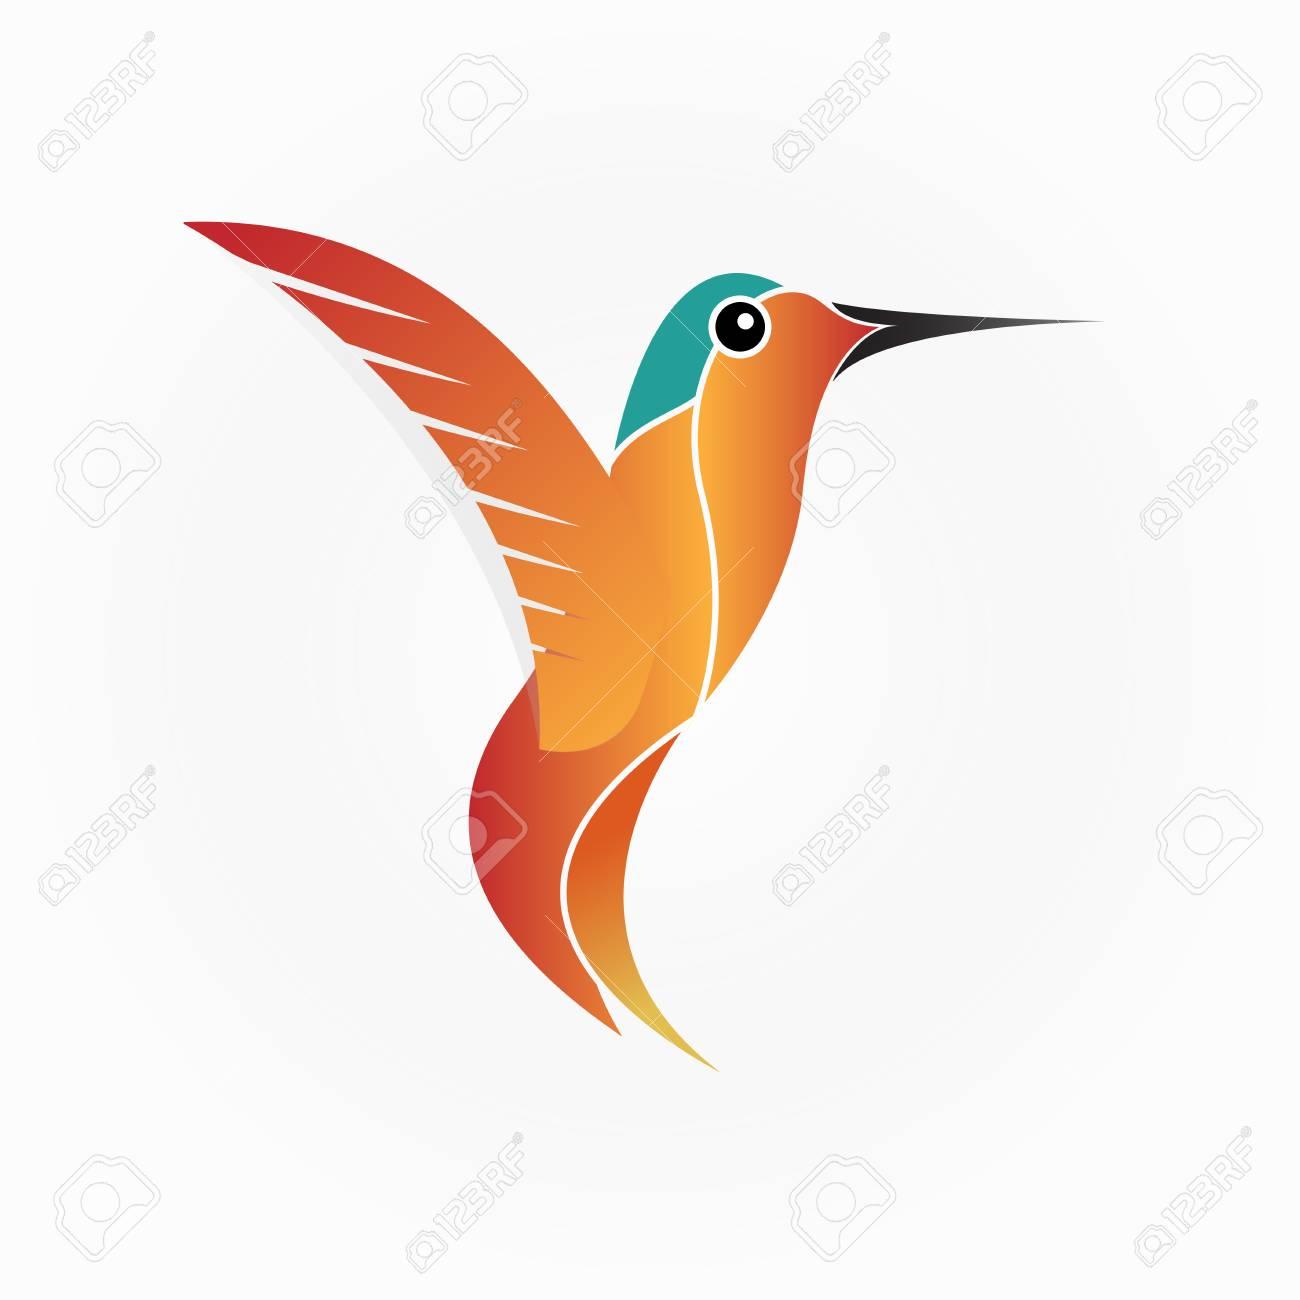 hummingbird vector illustration royalty free cliparts vectors